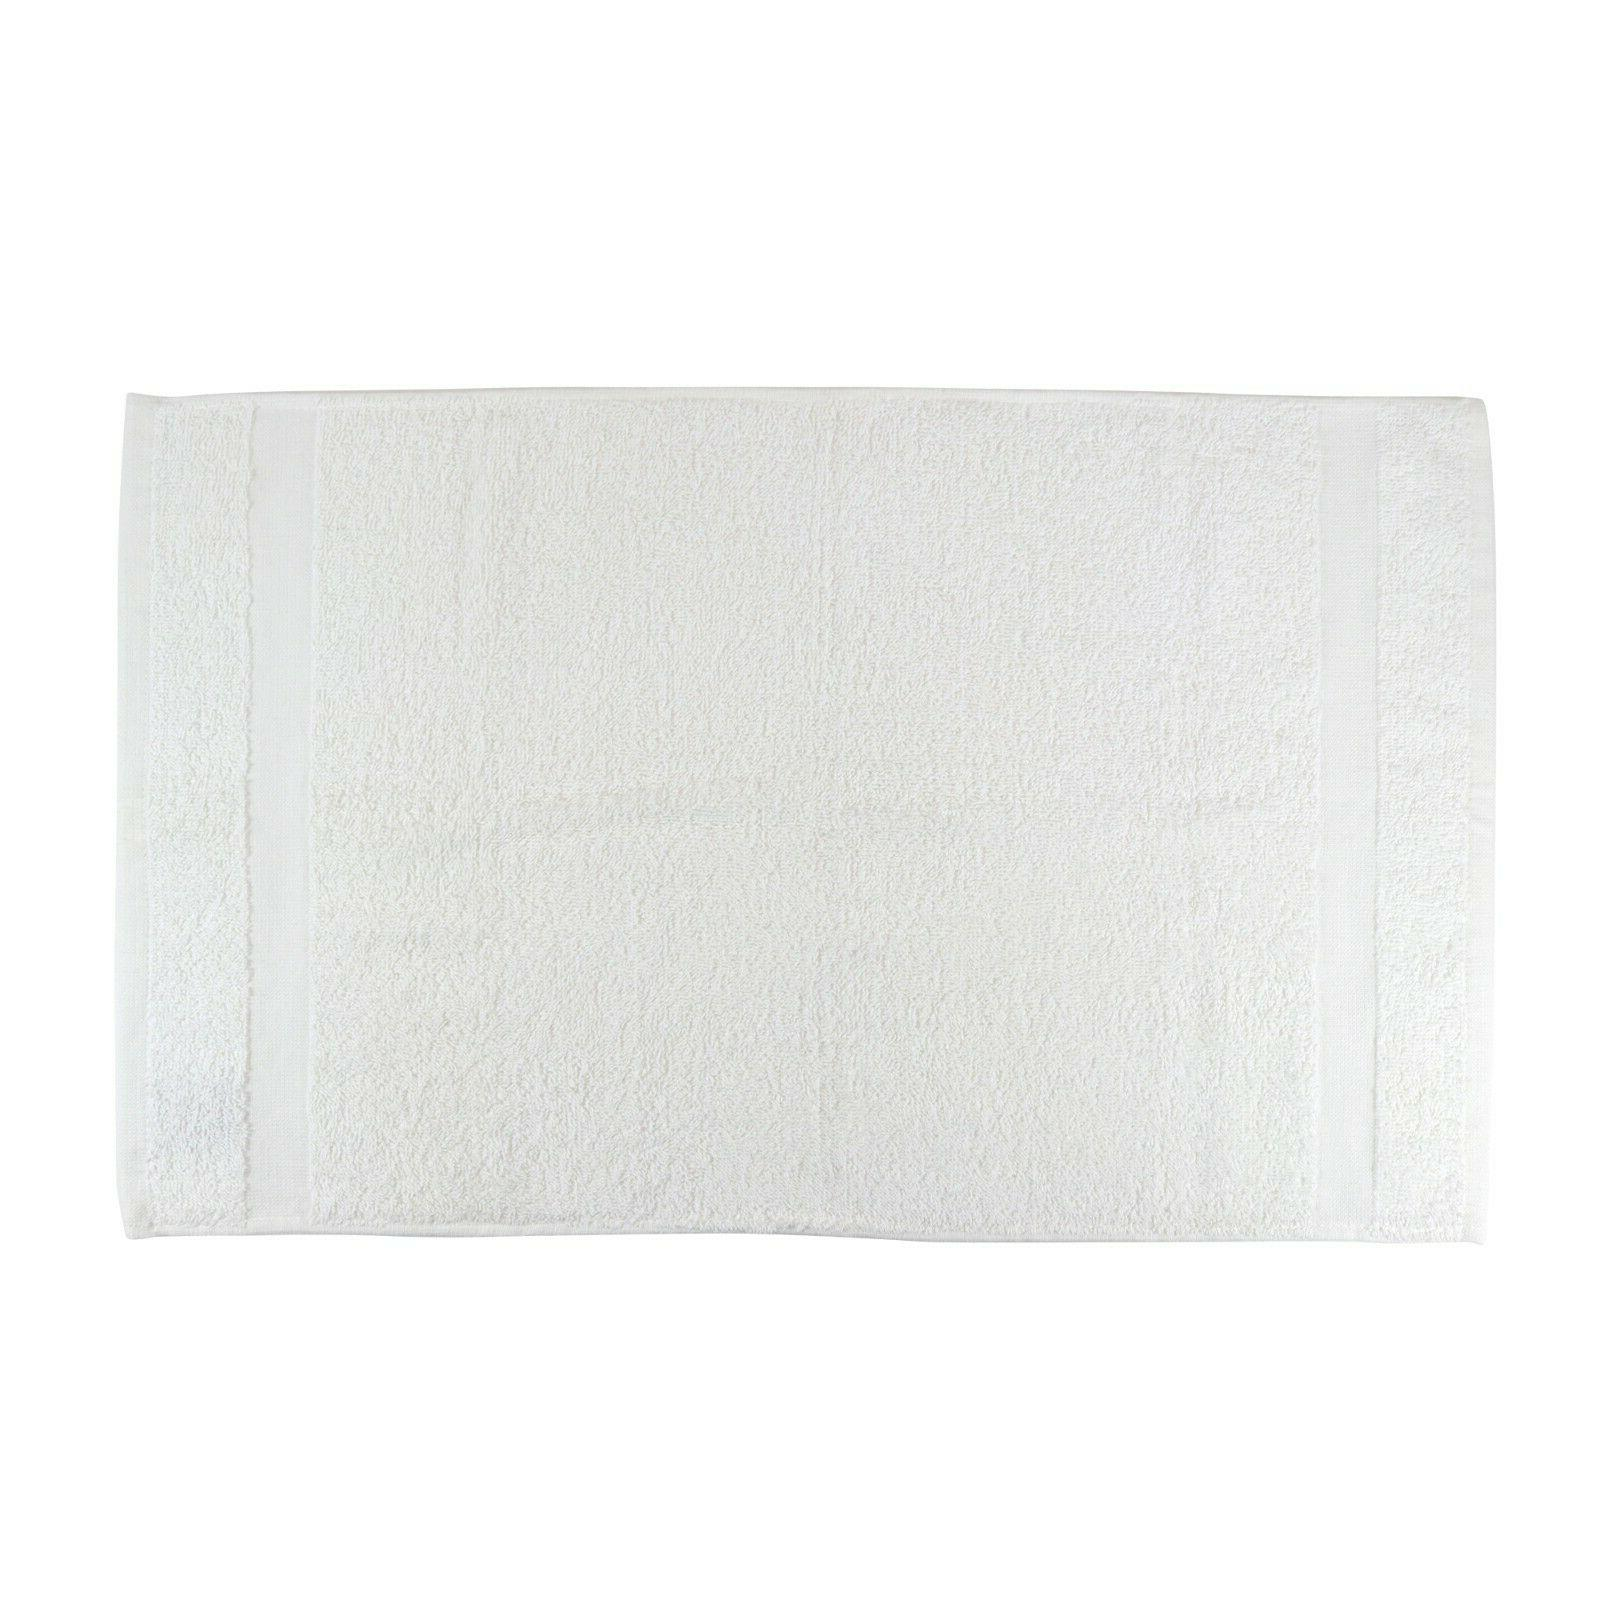 Case of Hand - White Multi-Purpose Wholesale Towels